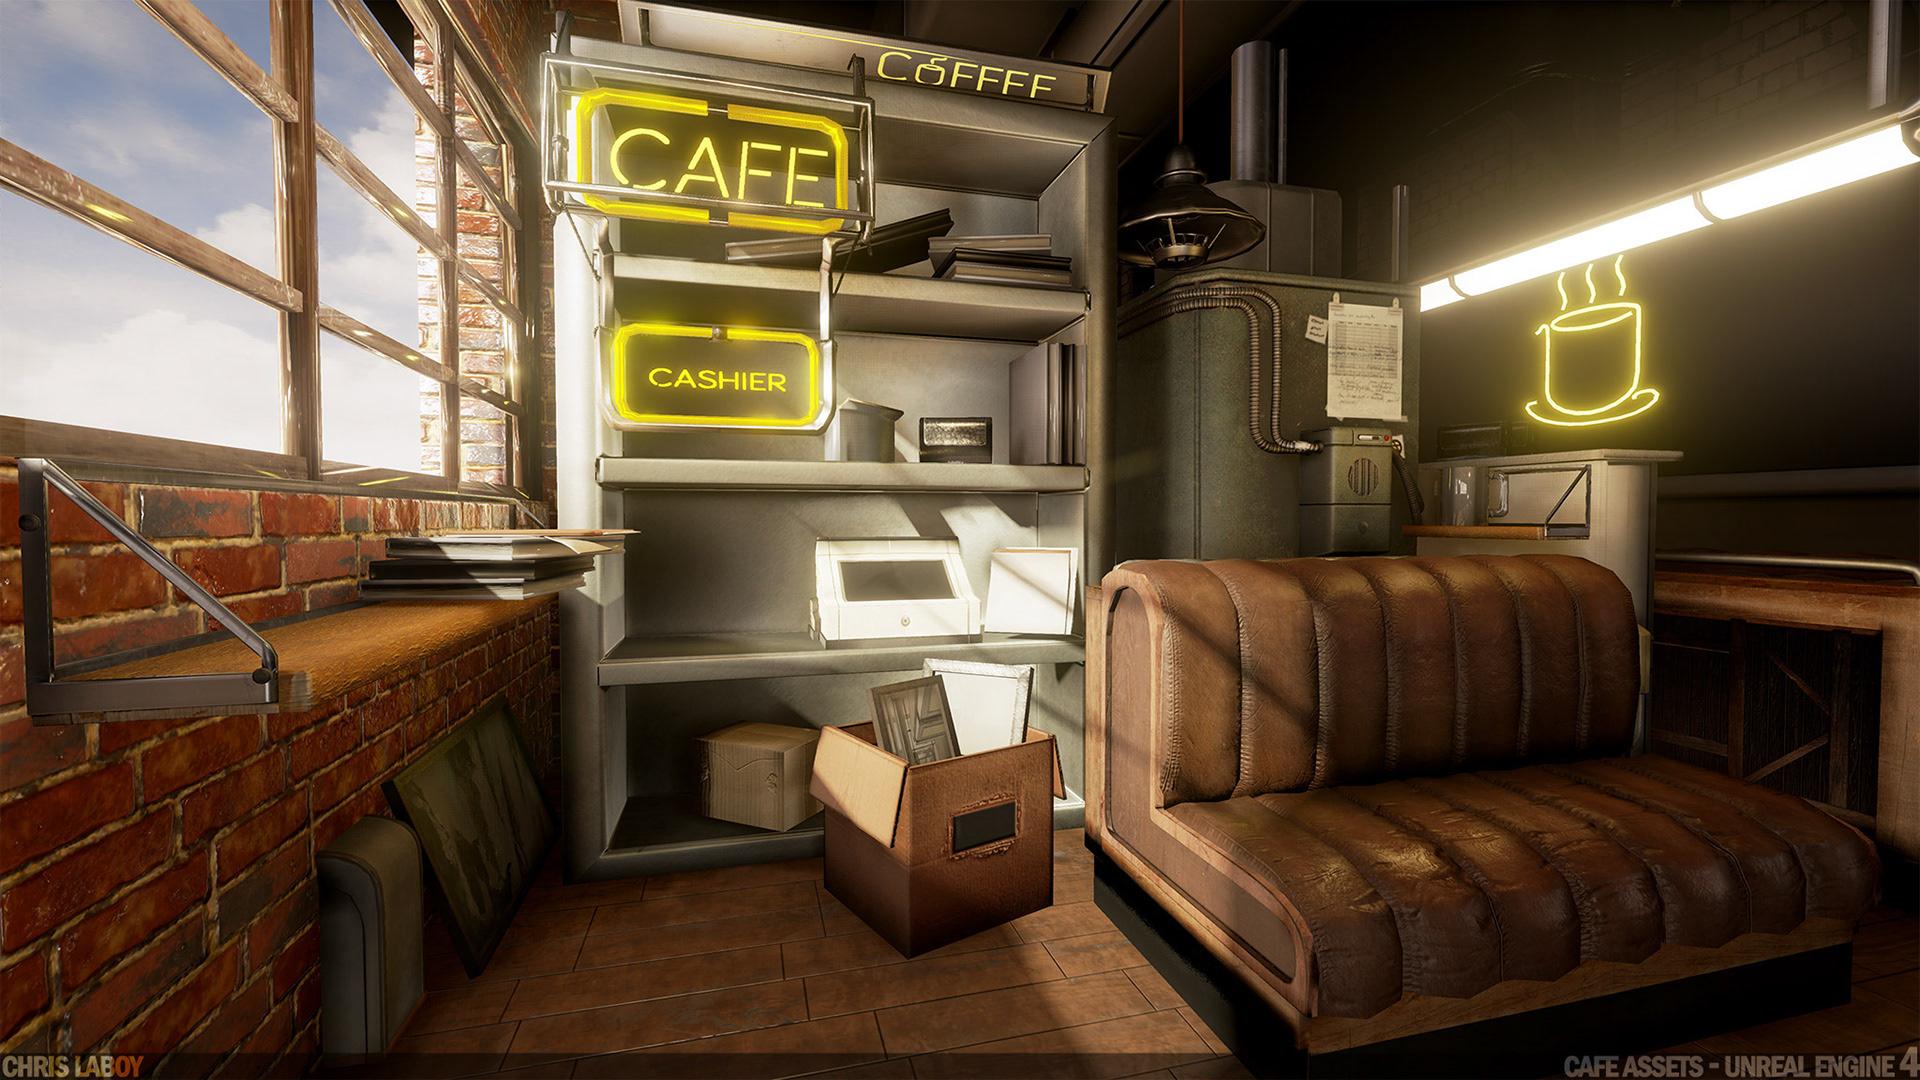 Chris LaBoy - Cafe